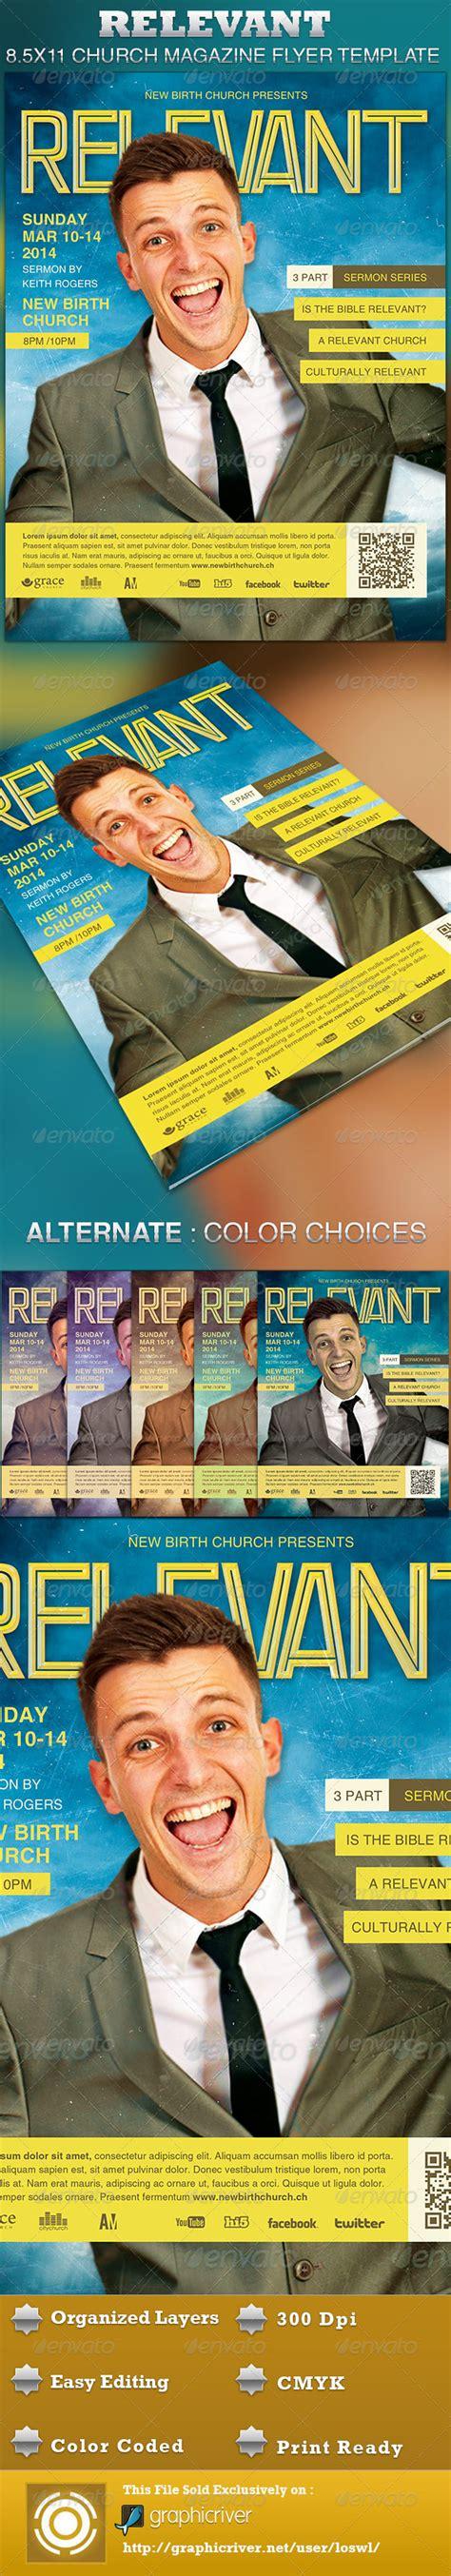 relevant church magazine flyer template psdbucket com